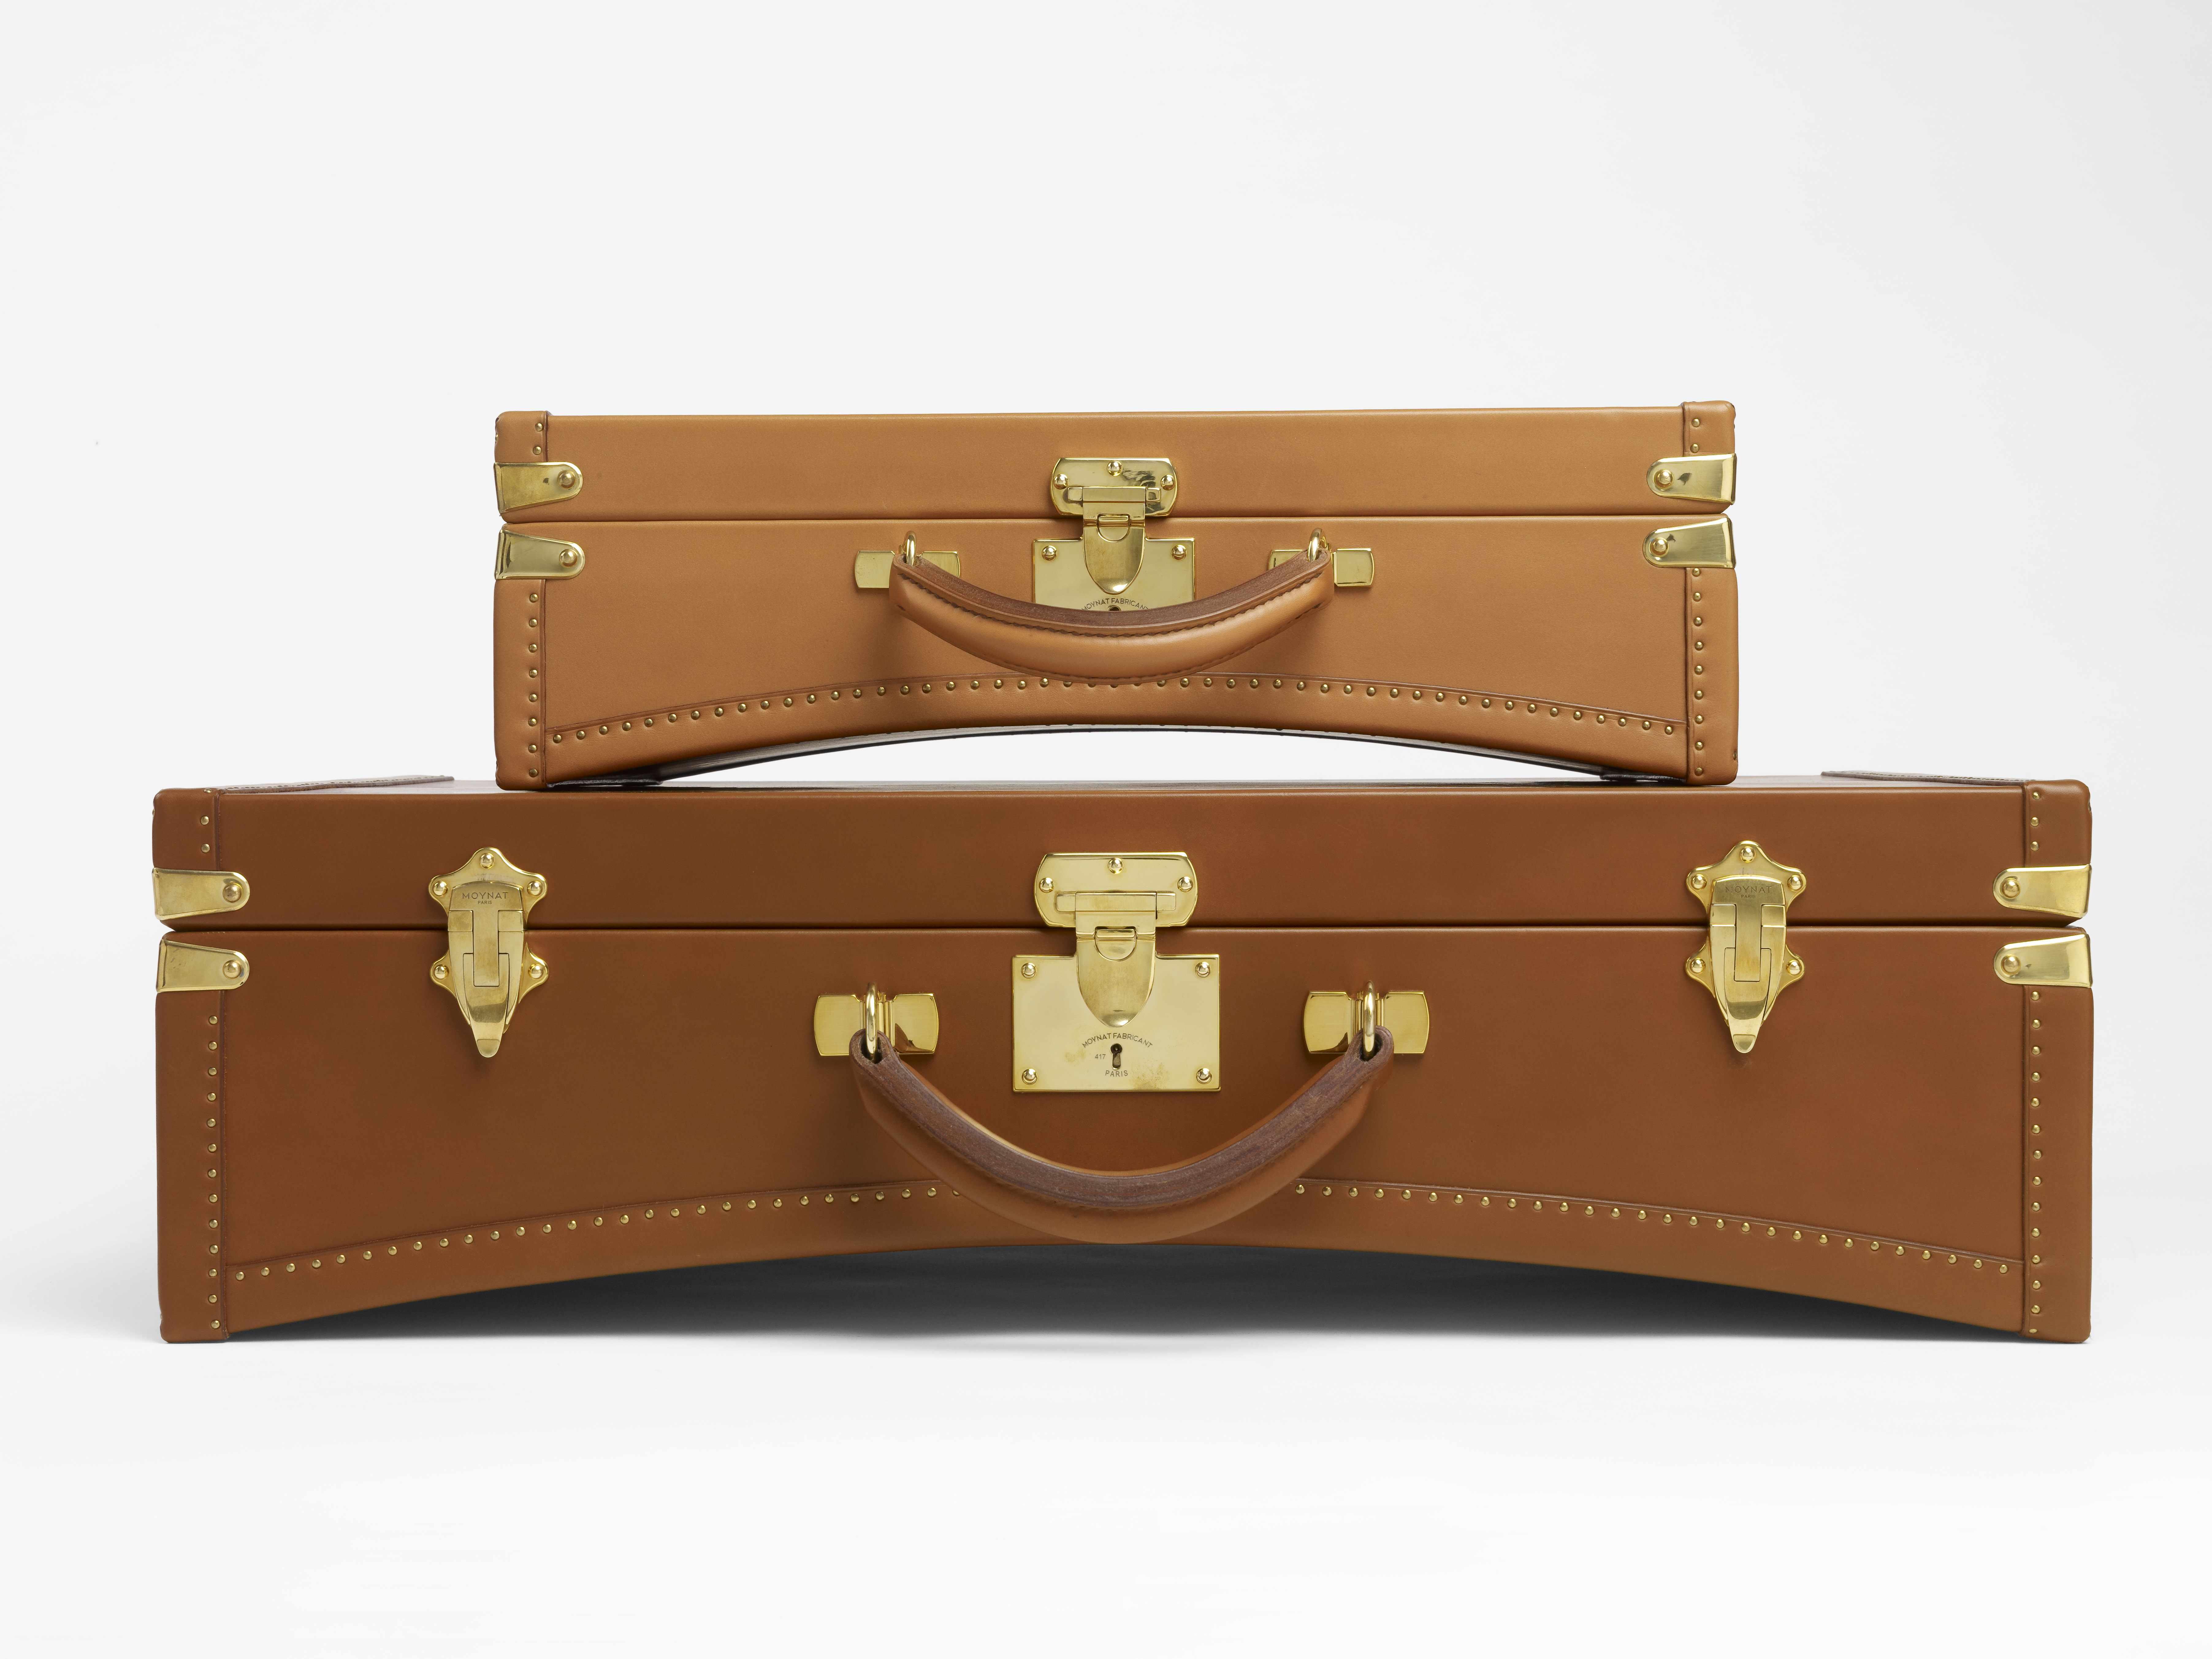 Moynat Paris' Limousine: the Rolls Royce of suitcases?